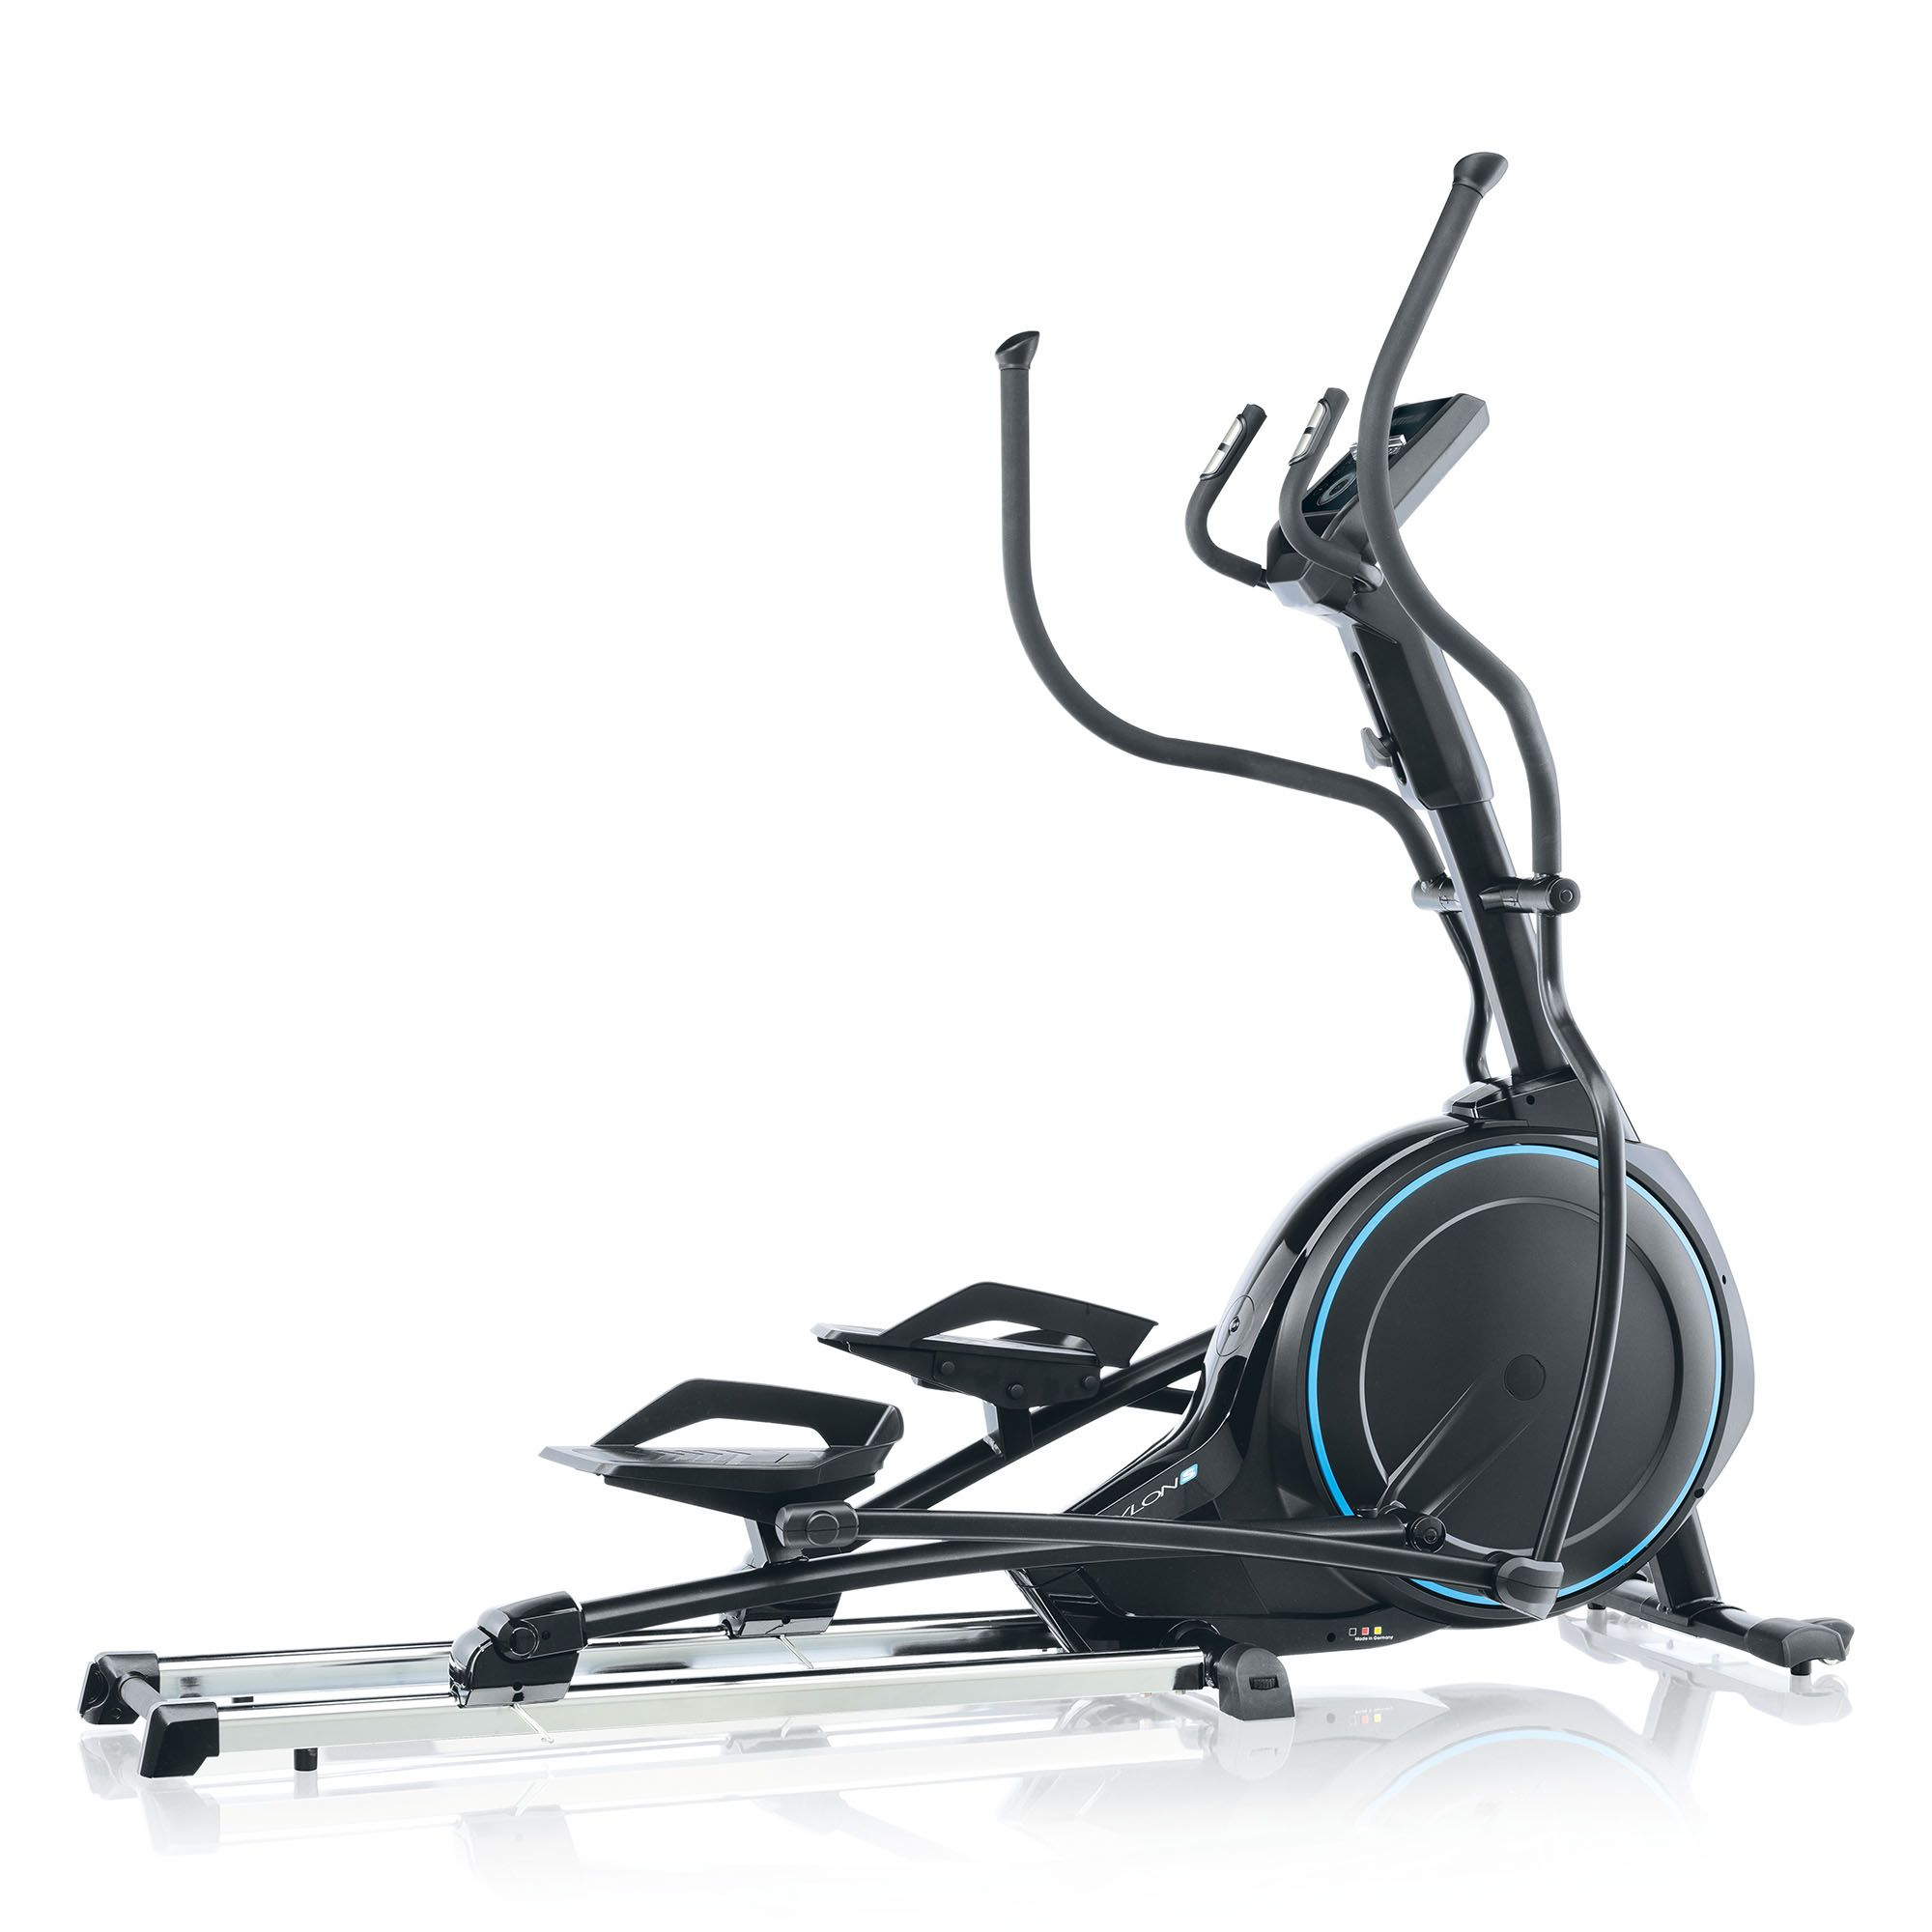 kettler skylon s folding elliptical cross trainer. Black Bedroom Furniture Sets. Home Design Ideas